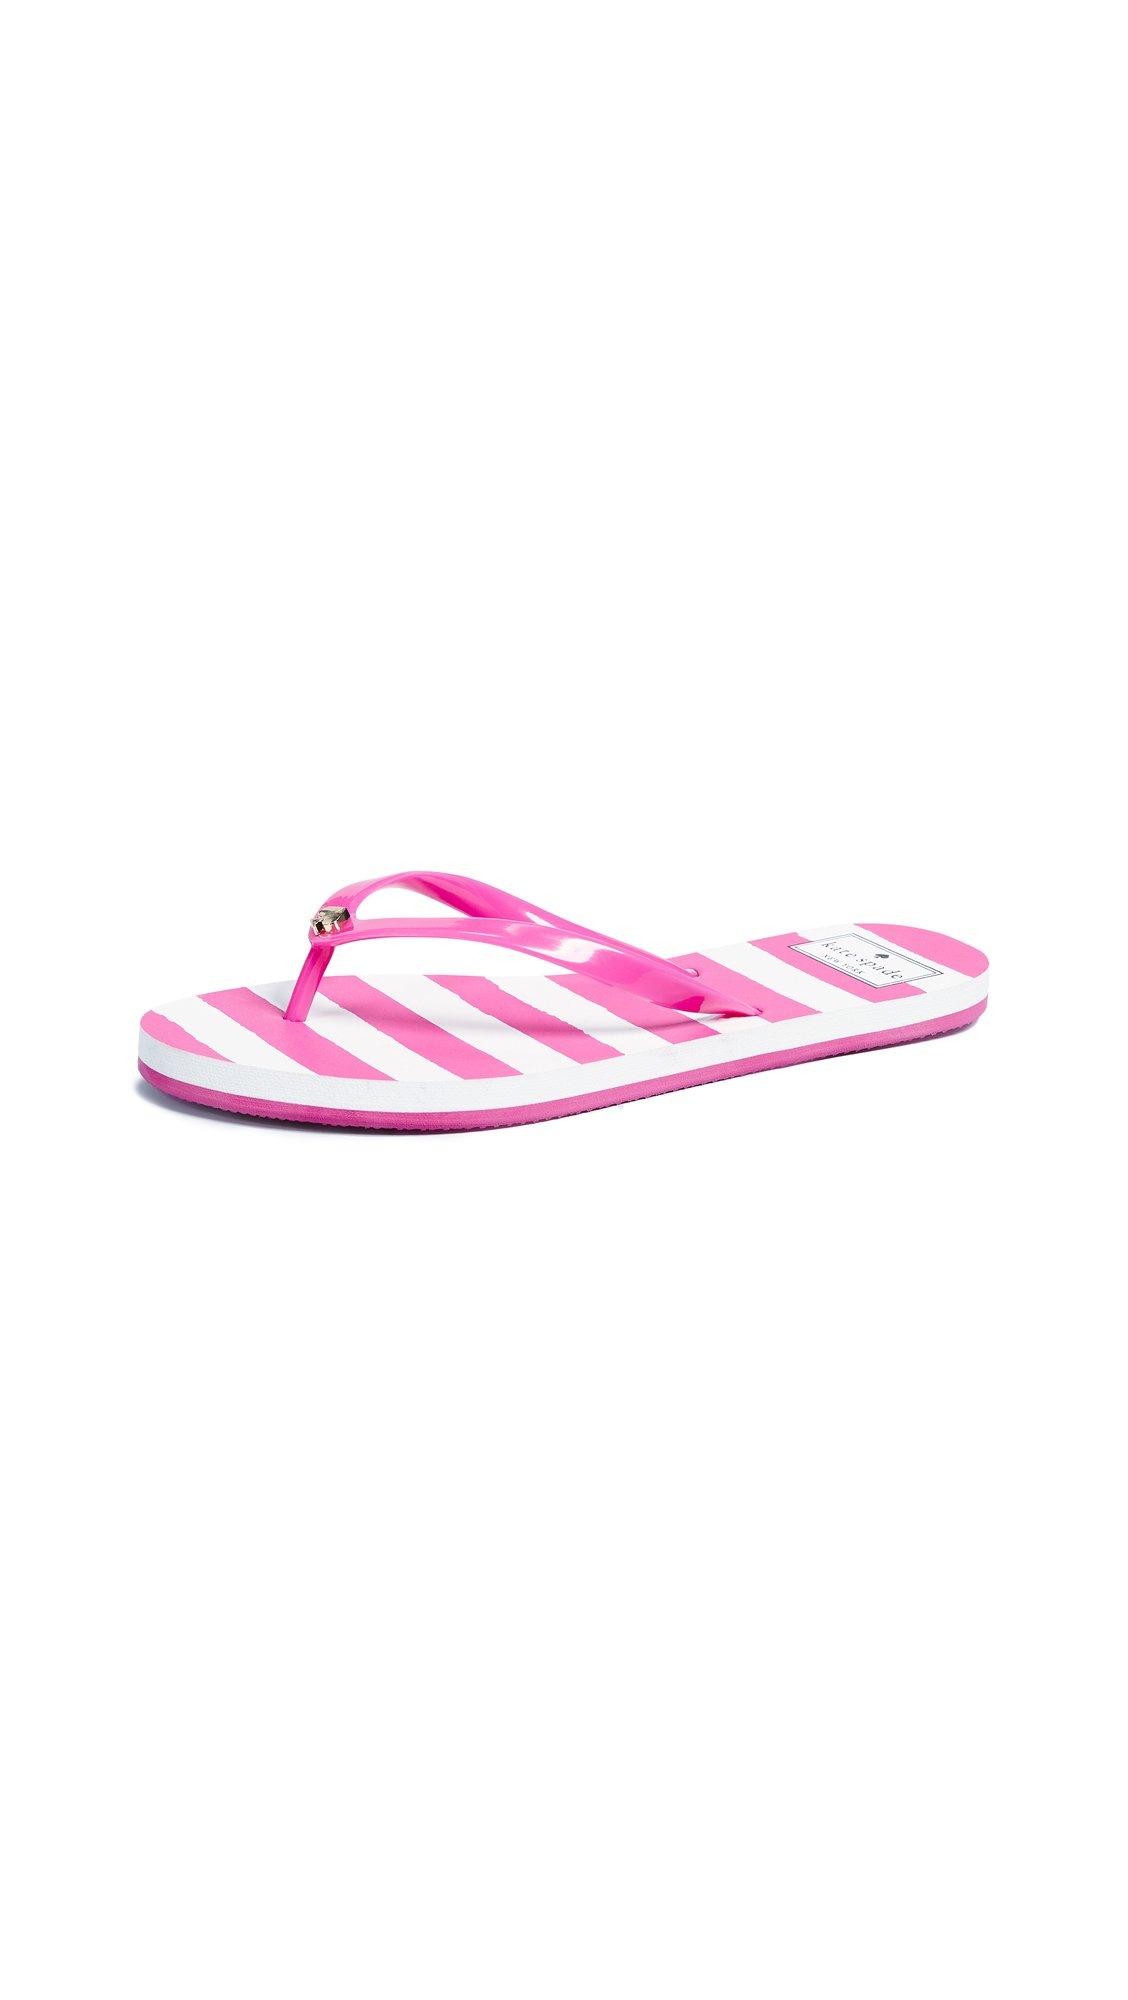 Kate Spade New York Women's Nassau Flip Flops, Pink/White Stripe, 8 M US